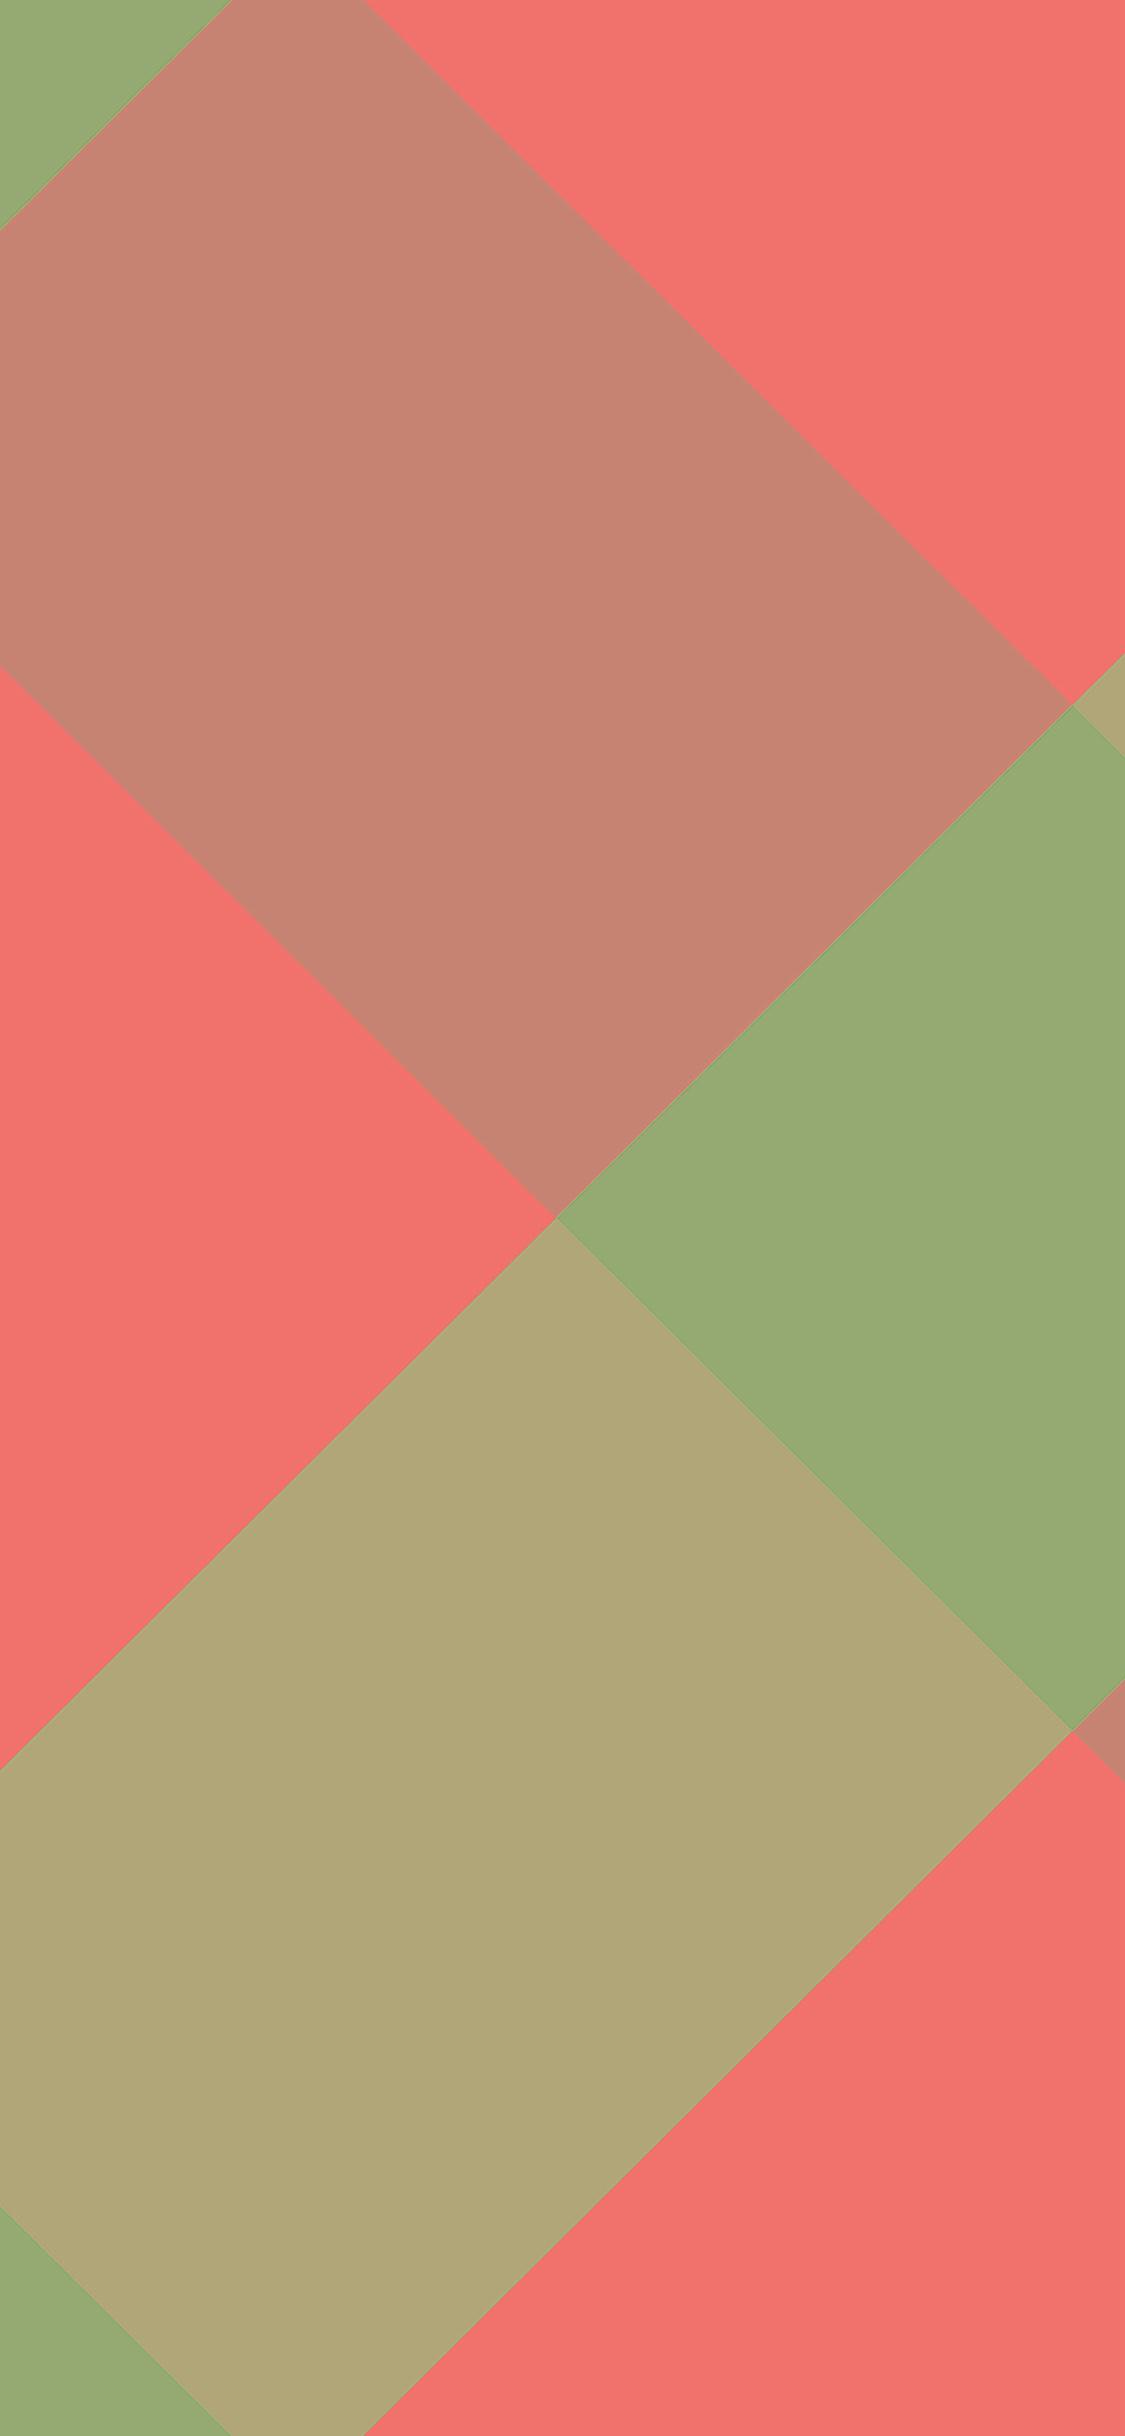 Iphone X Wallpaper Size Parallax Iphone